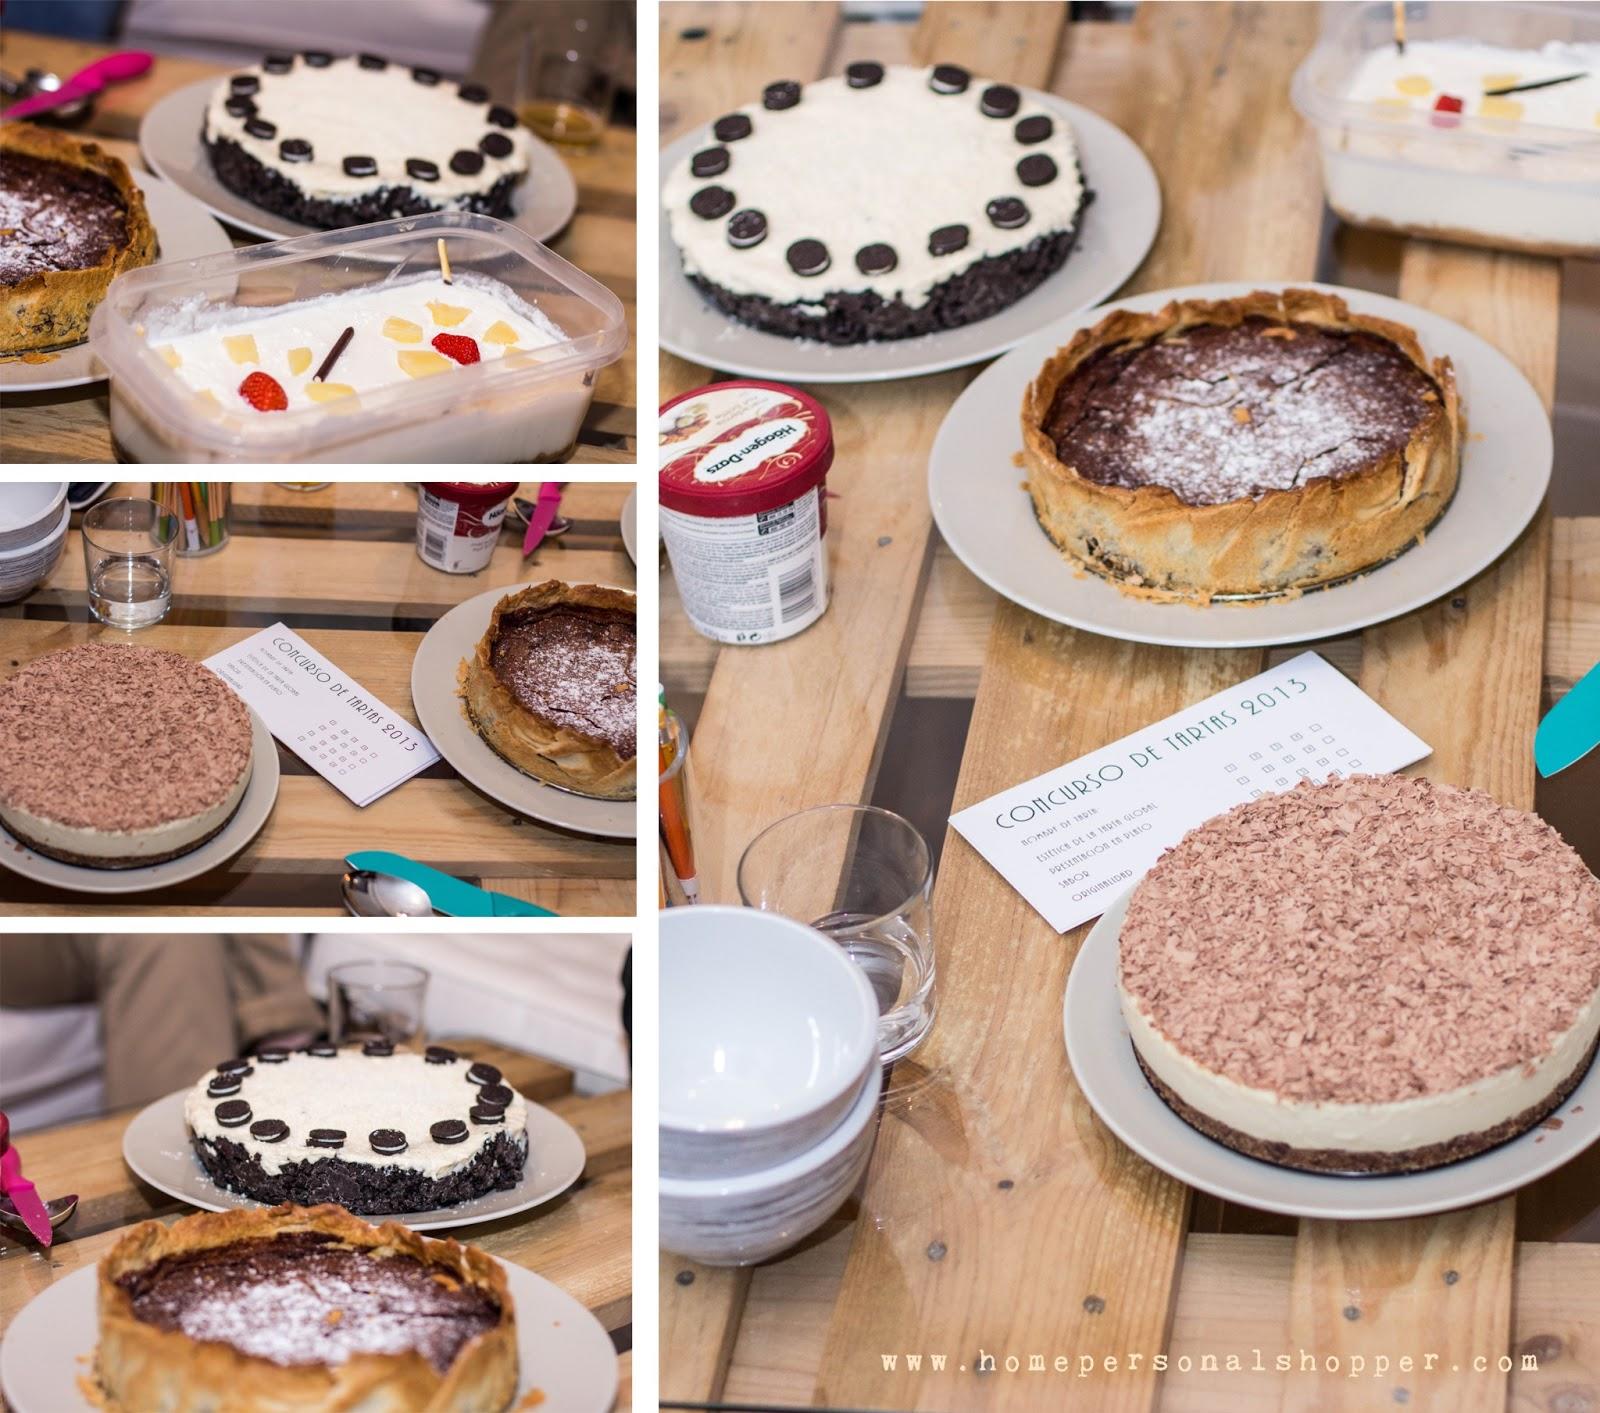 Oreo Cheesecake, tarta queso con oreo, galleta, homepersonalshopper, receta